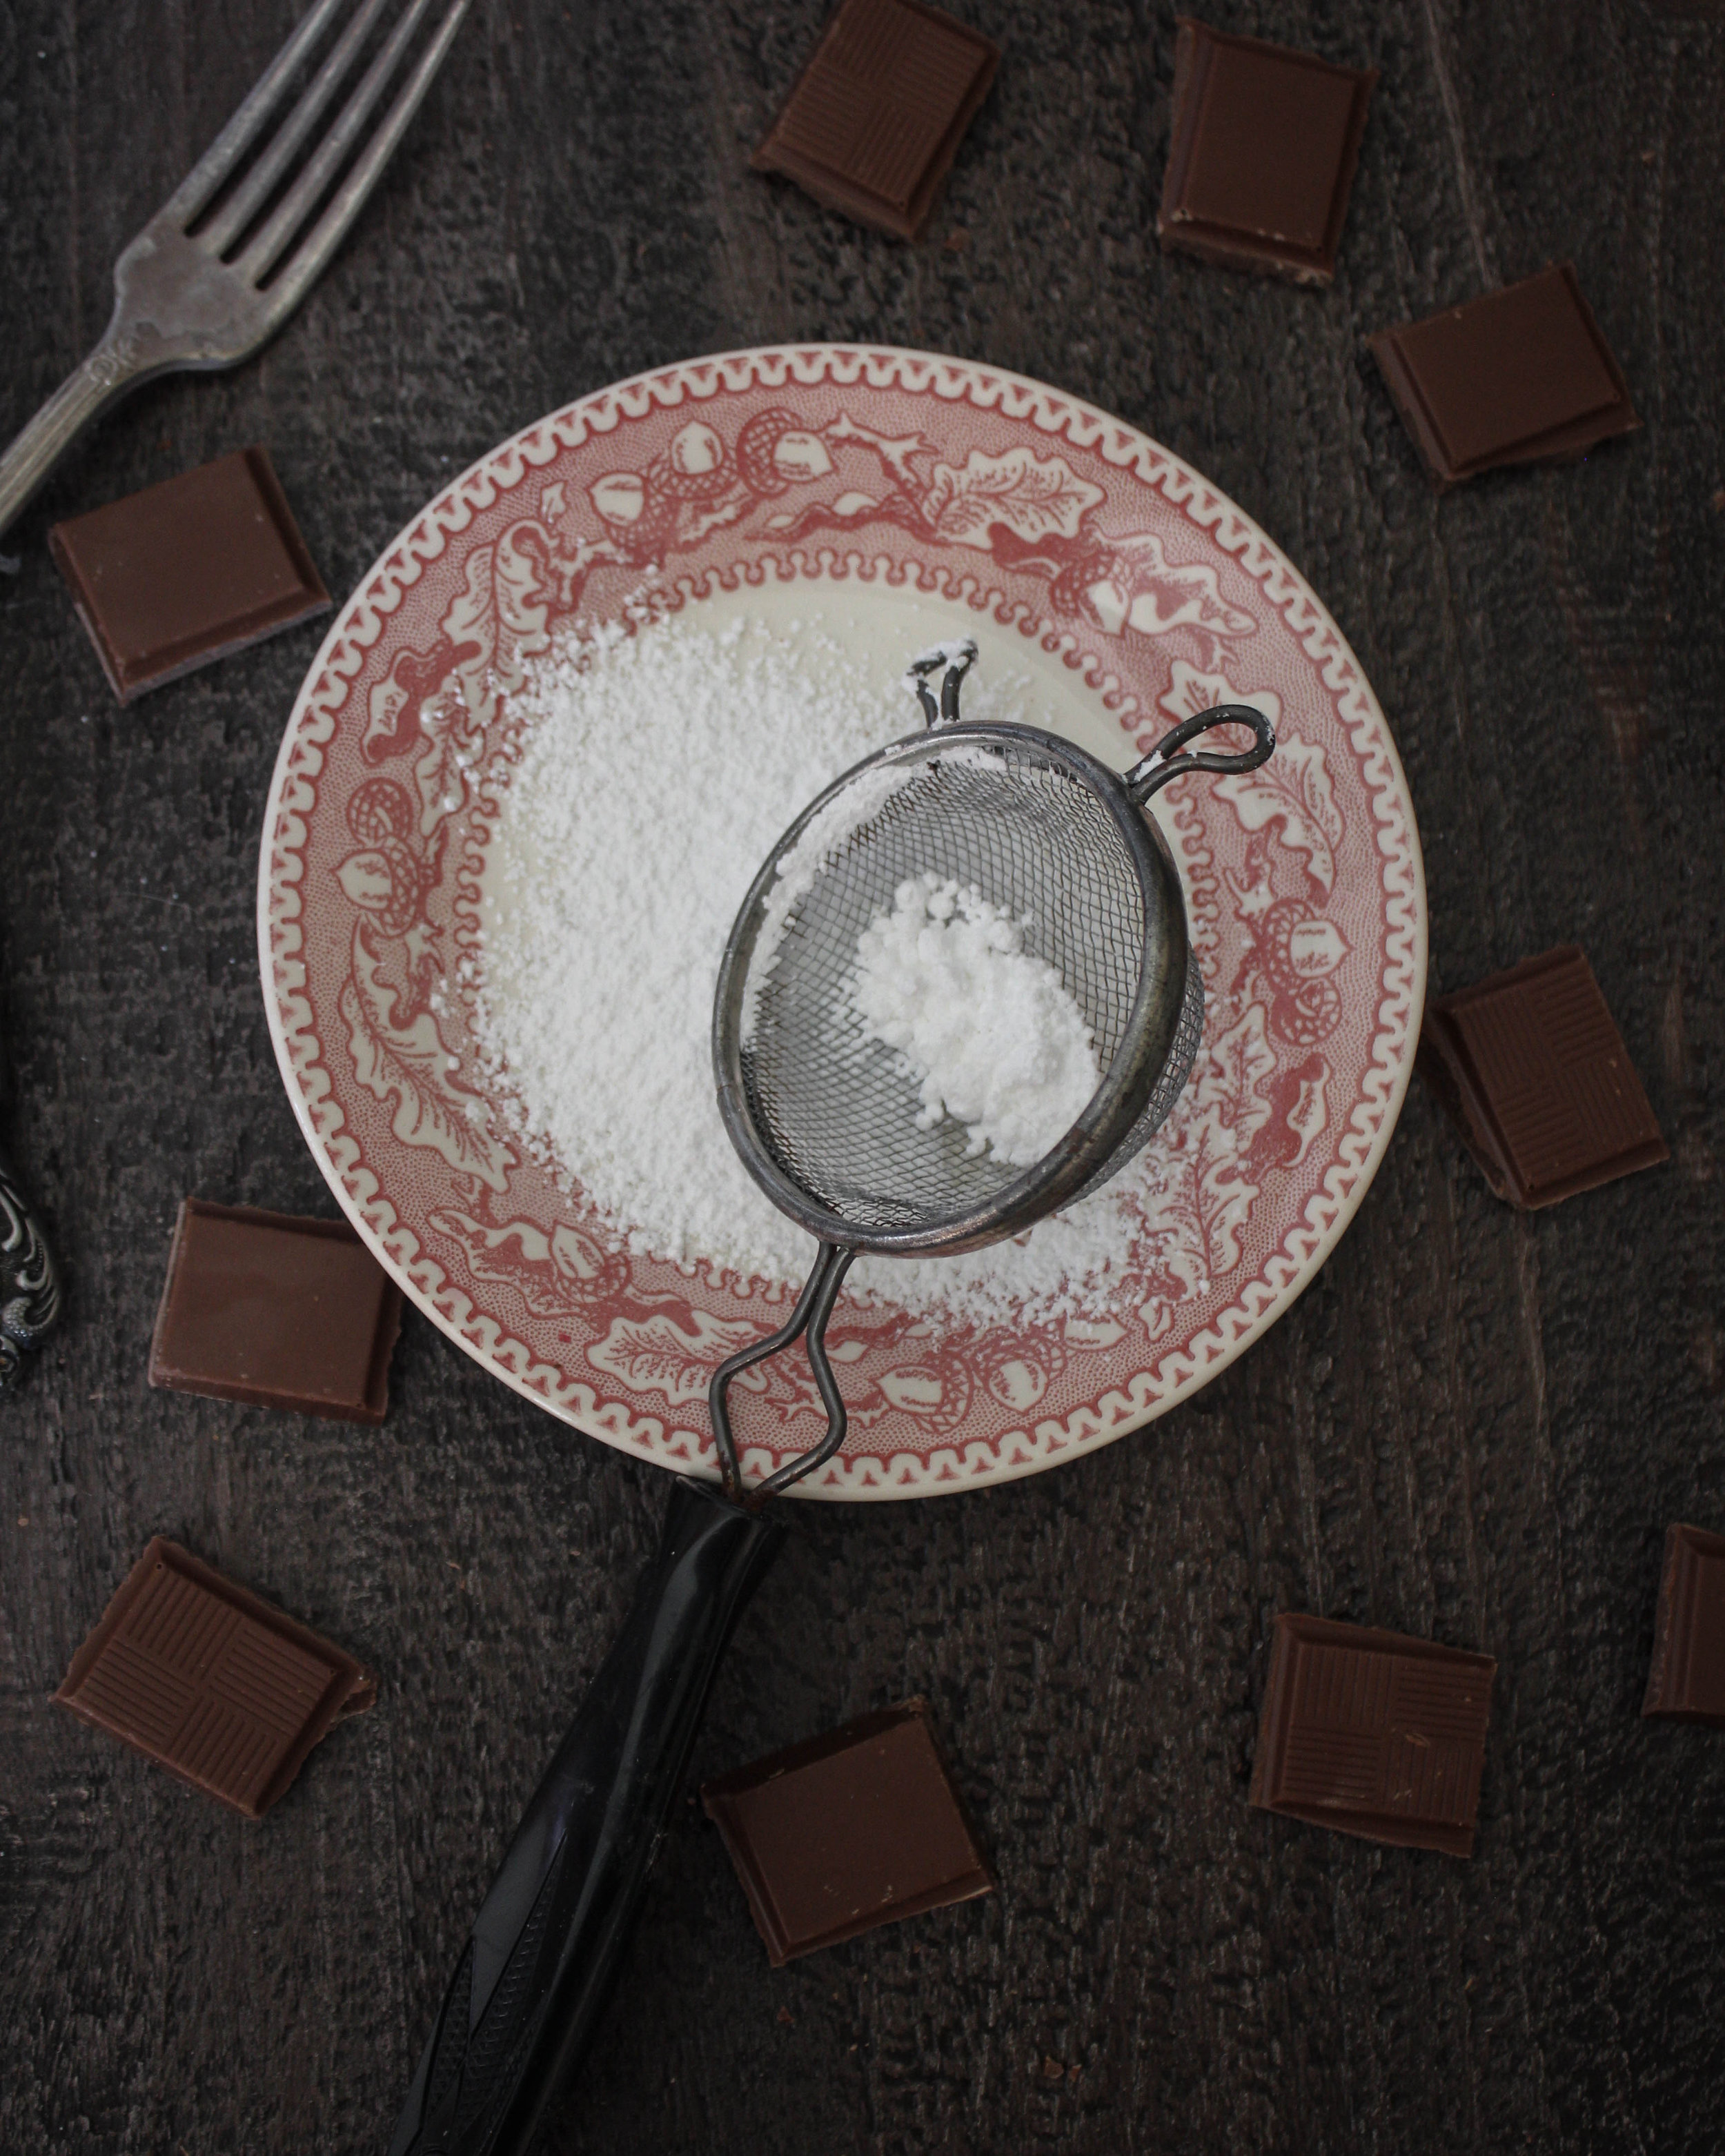 Dutch Oven Chocolate Cake with Staub